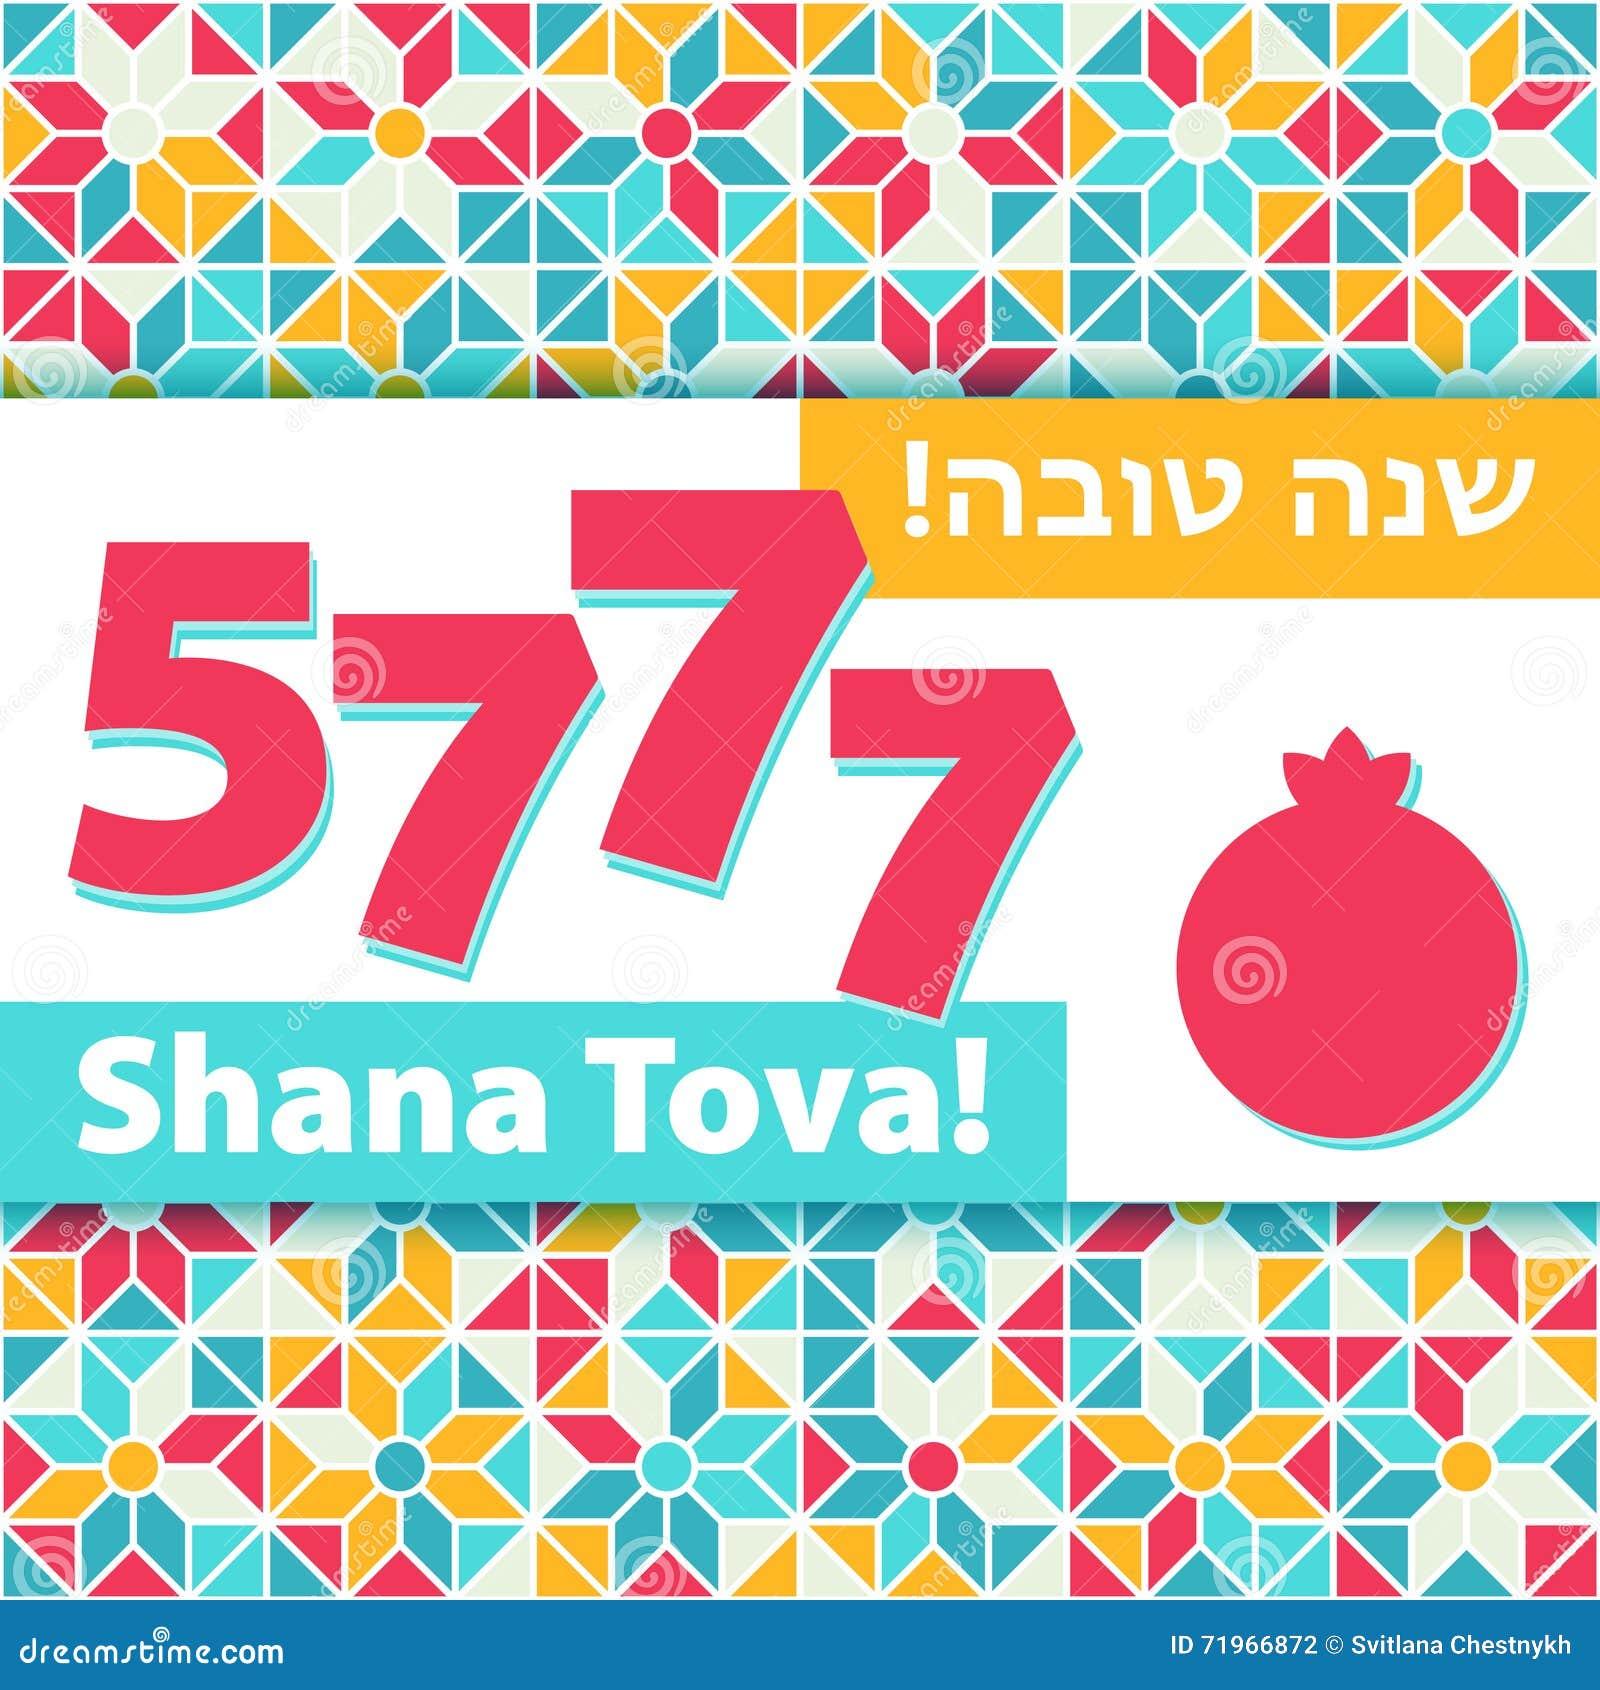 Shana tova greeting stock vector illustration of rosh 10711800 rosh hashana greeting card shana tova 5777 stock photography kristyandbryce Images